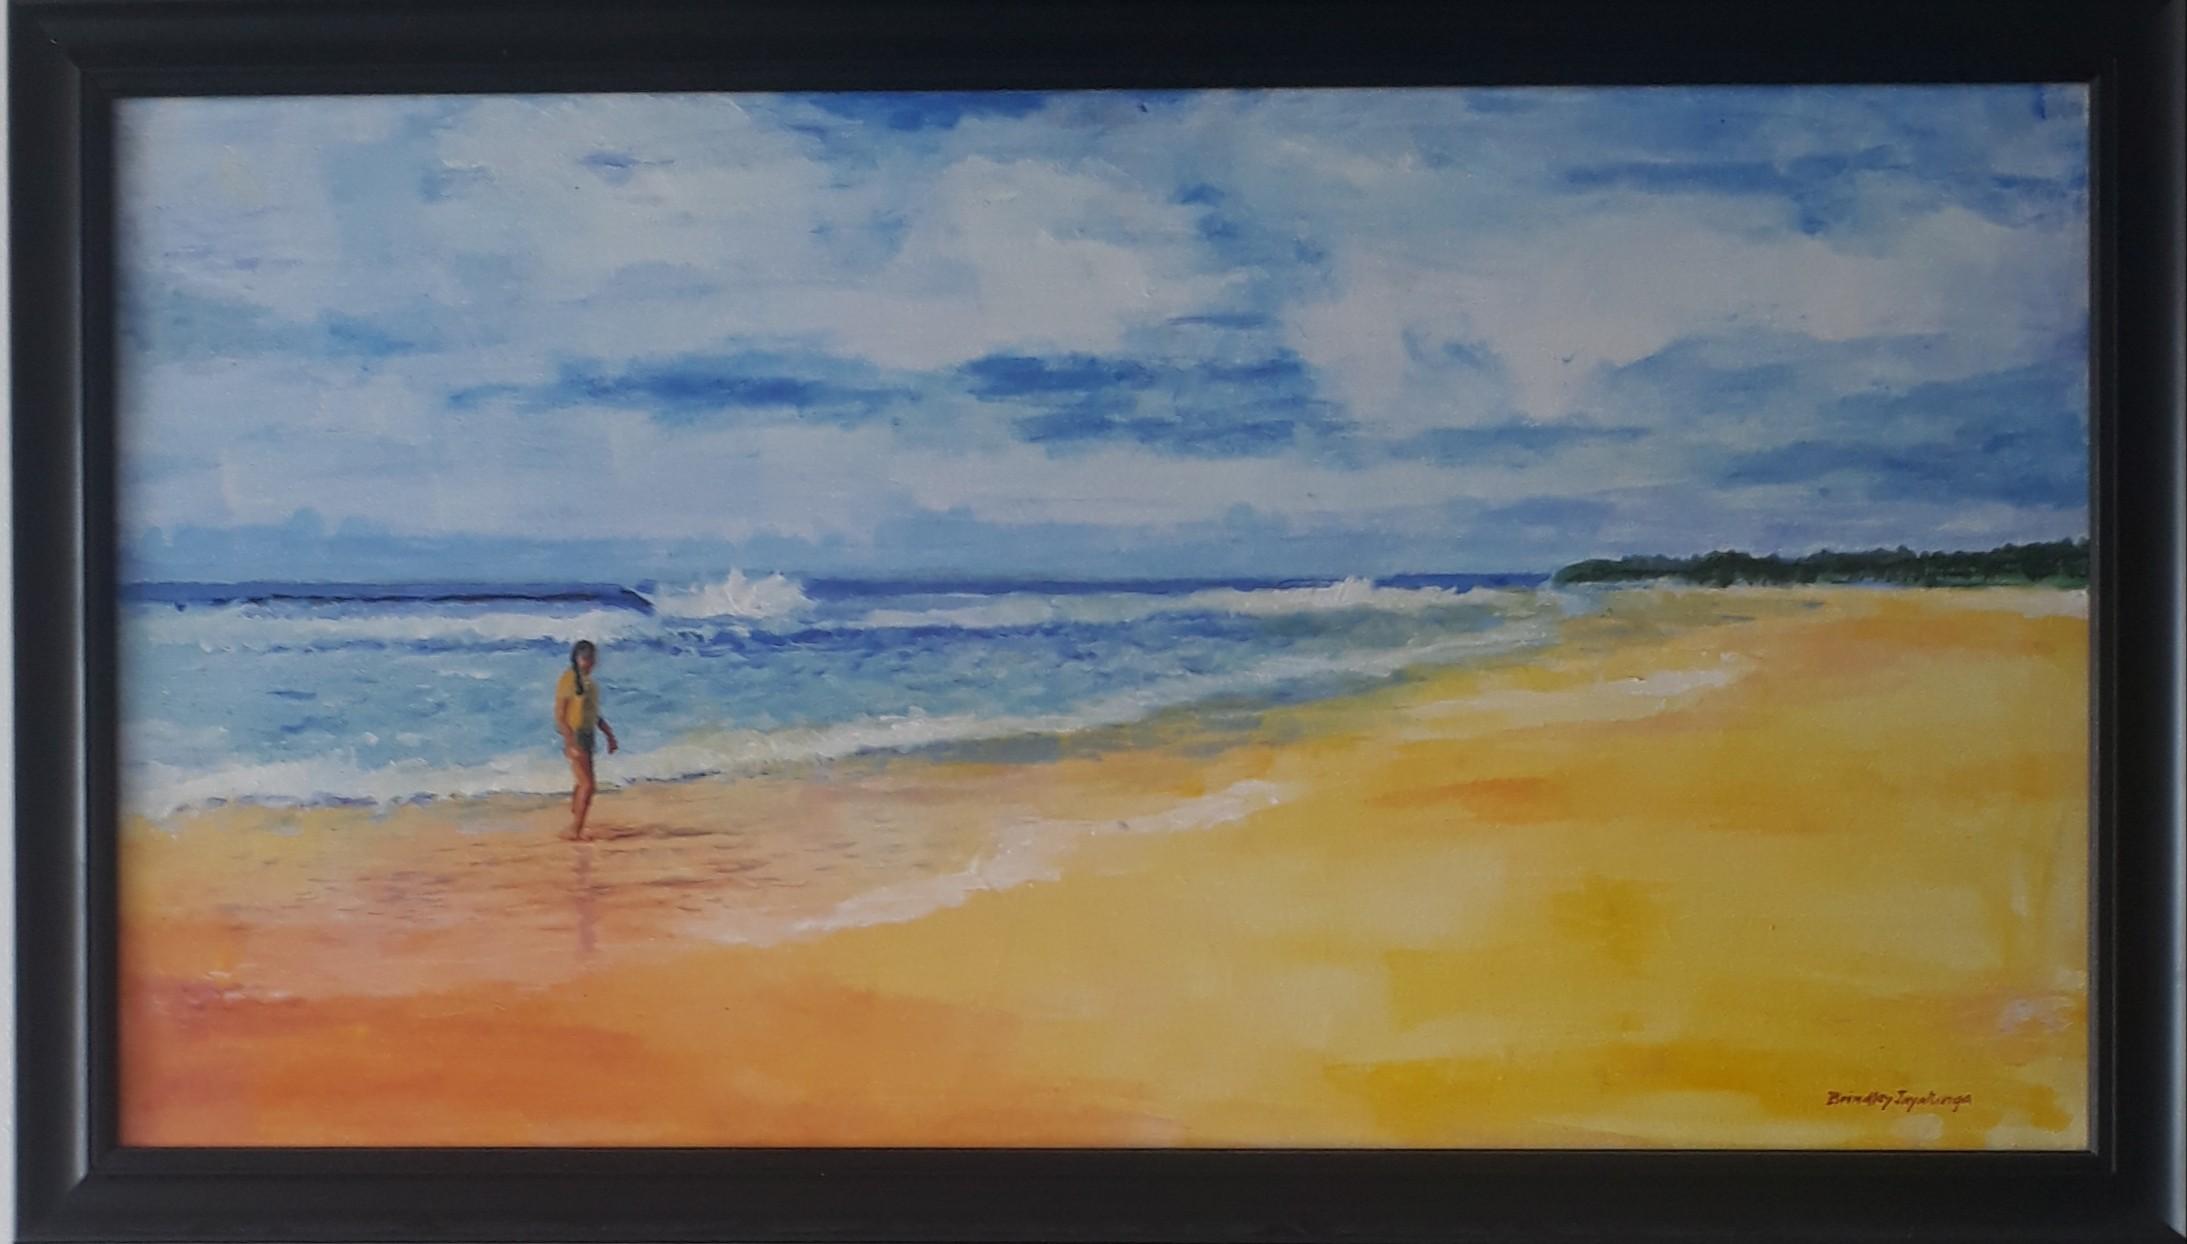 Koggala Beach by Brindley Jayatunga